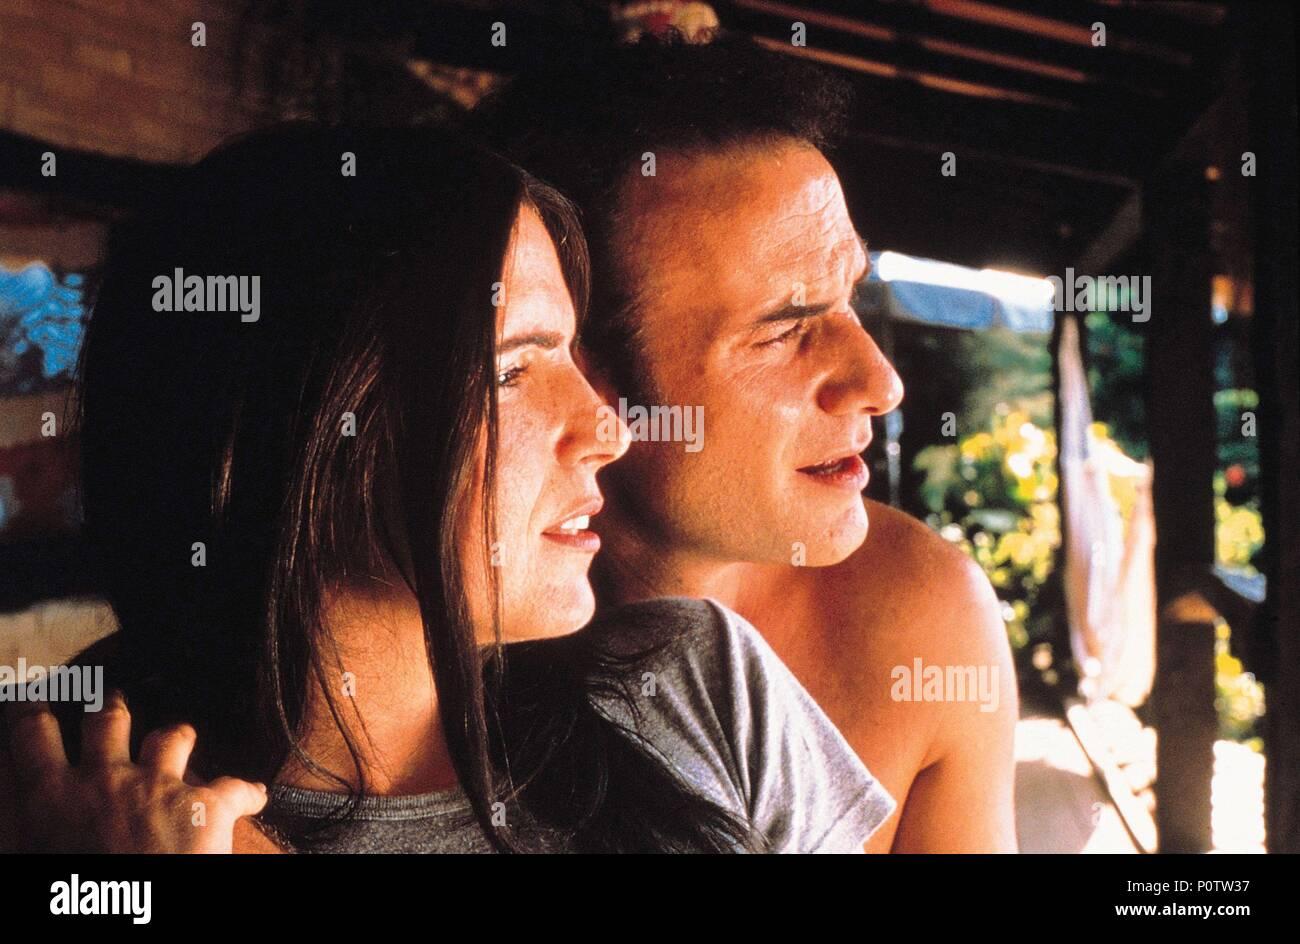 Original Film Title: O INVASOR.  English Title: TRESPASSER, THE.  Film Director: BETO BRANT.  Year: 2002. Credit: DRAMA FILMES/TIBET FILME/EUROPA FILMES/VIDEOFILMES/QUANDRA / EL KOBBI, EDUARDO / Album - Stock Image